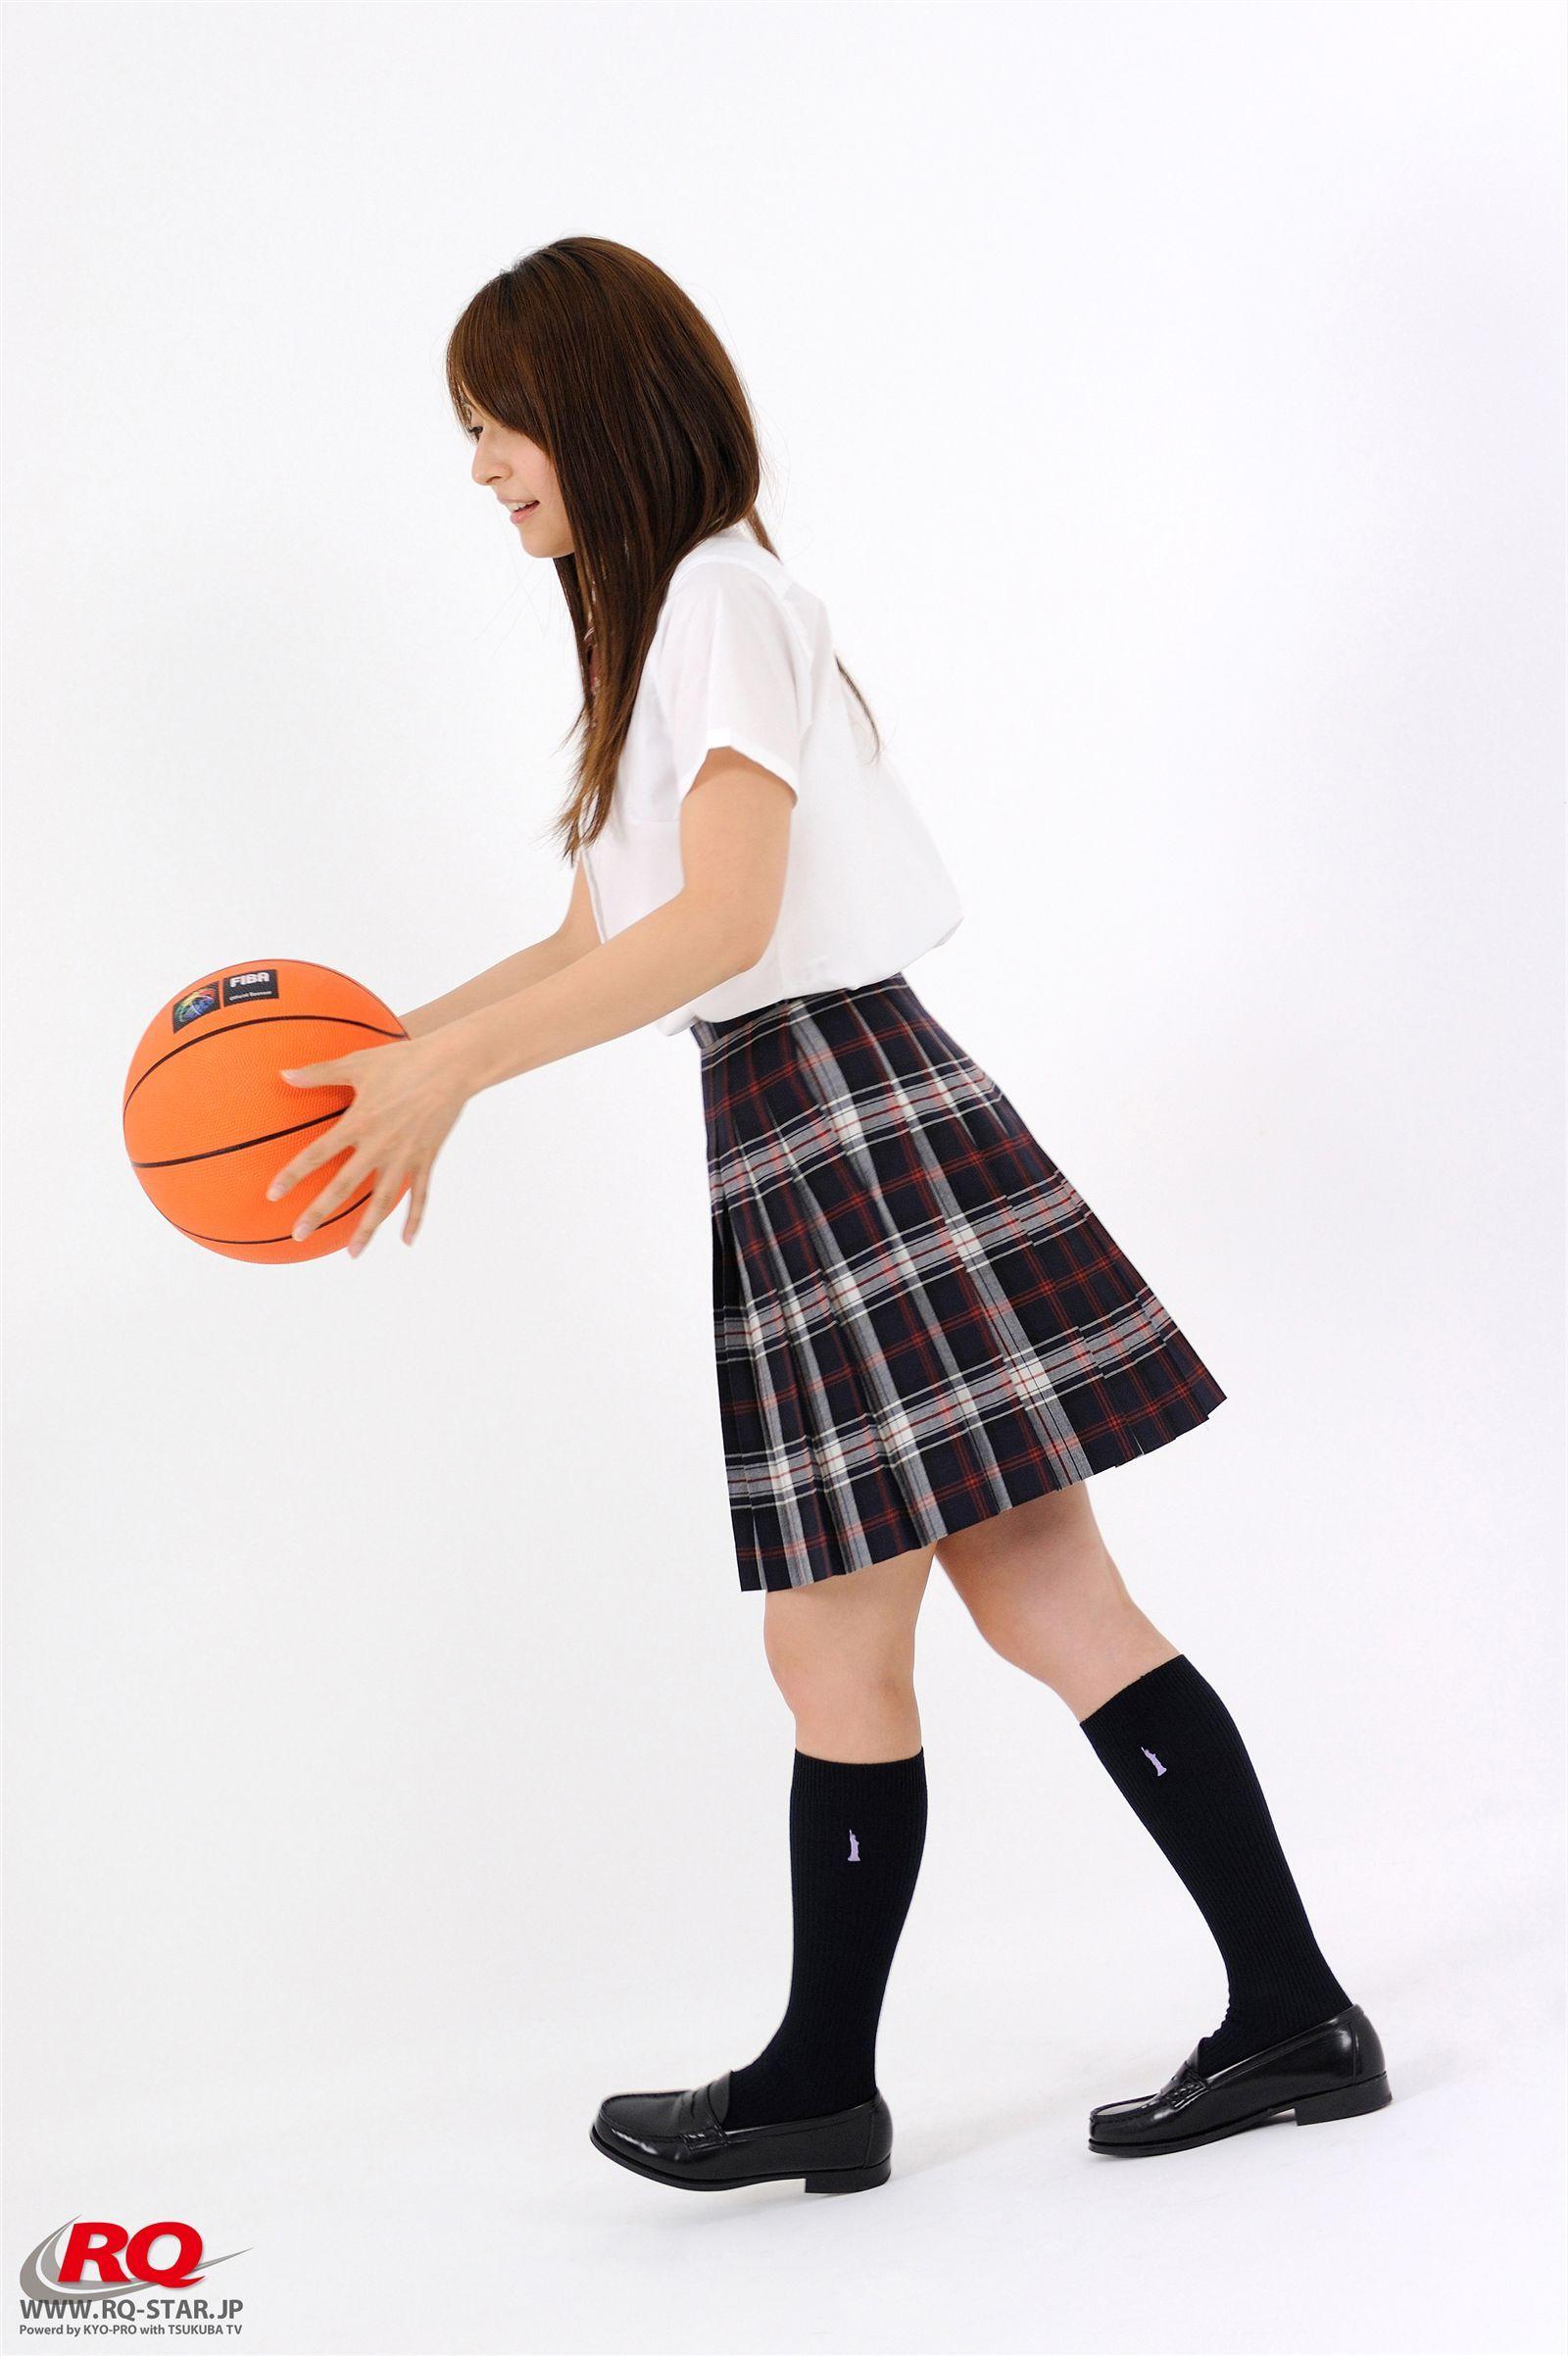 [RQ STAR美女] NO.01148 Rena Sawai 澤井玲菜 Student Style[40P] RQ STAR 第3张